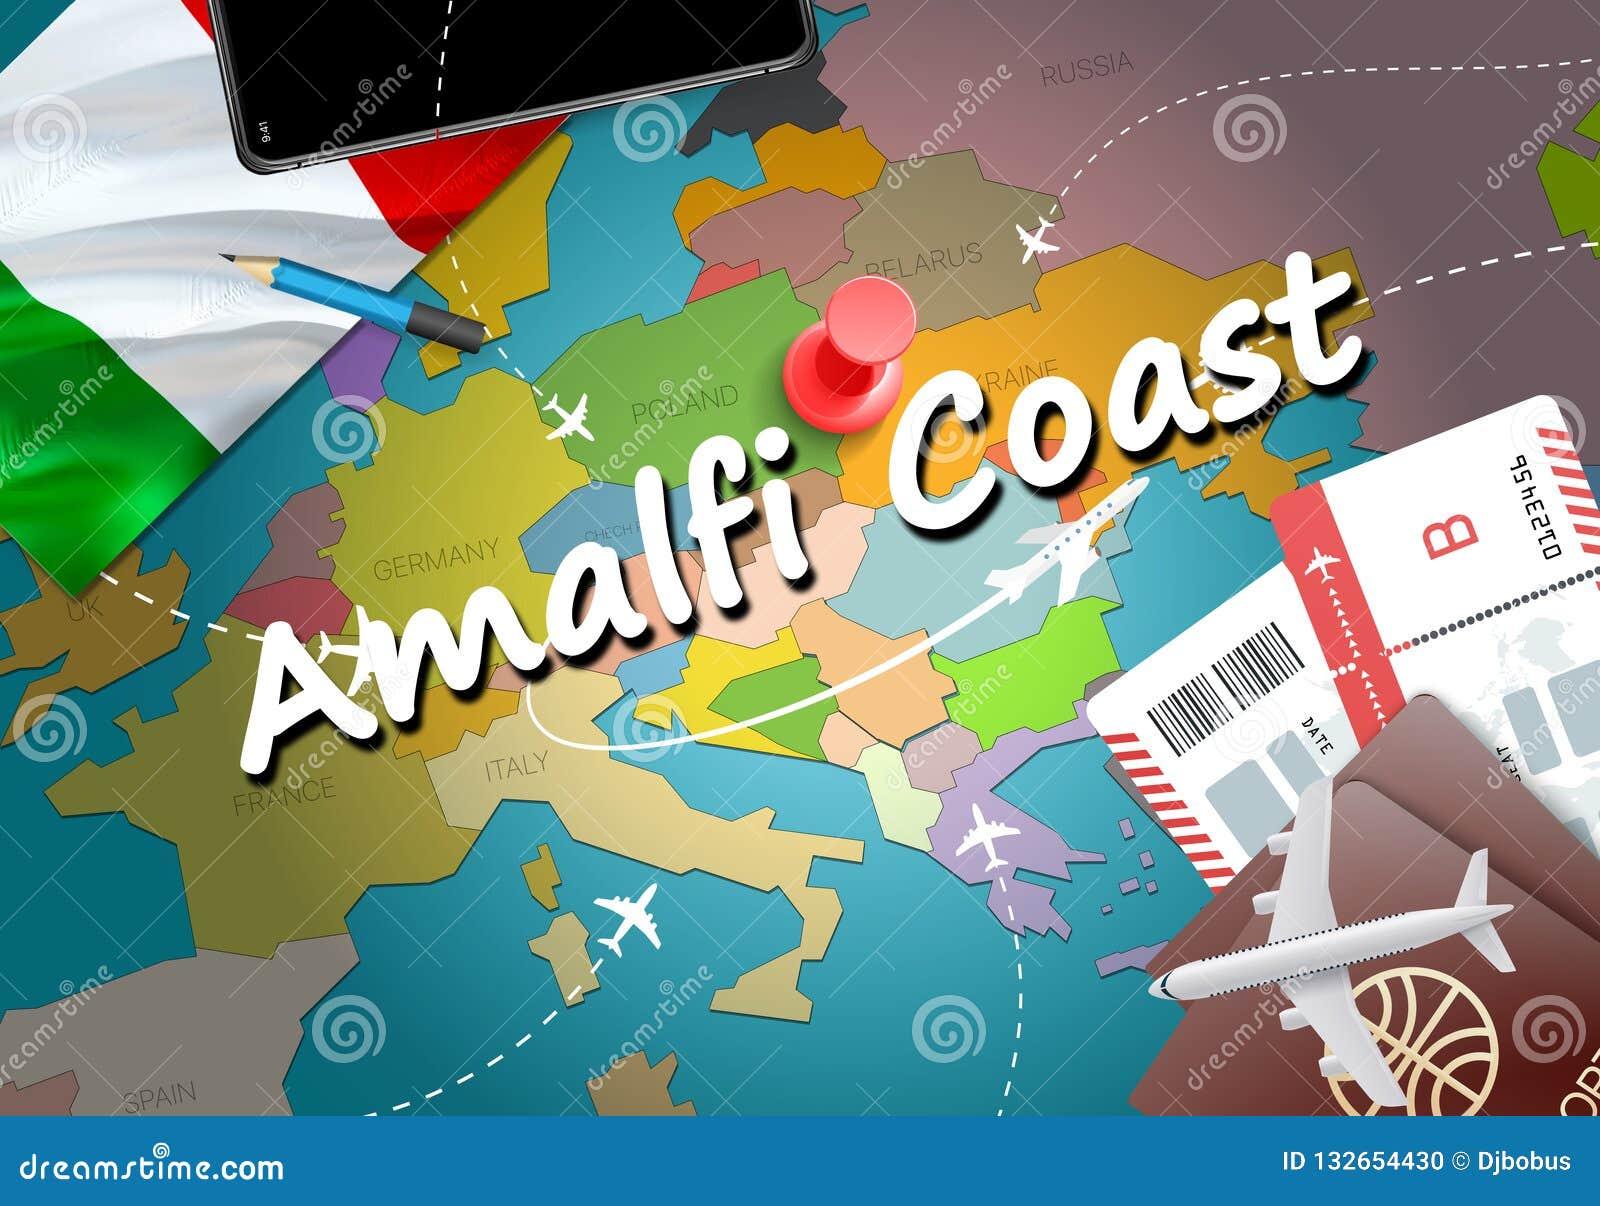 Amalfi Coast City Travel And Tourism Destination Concept